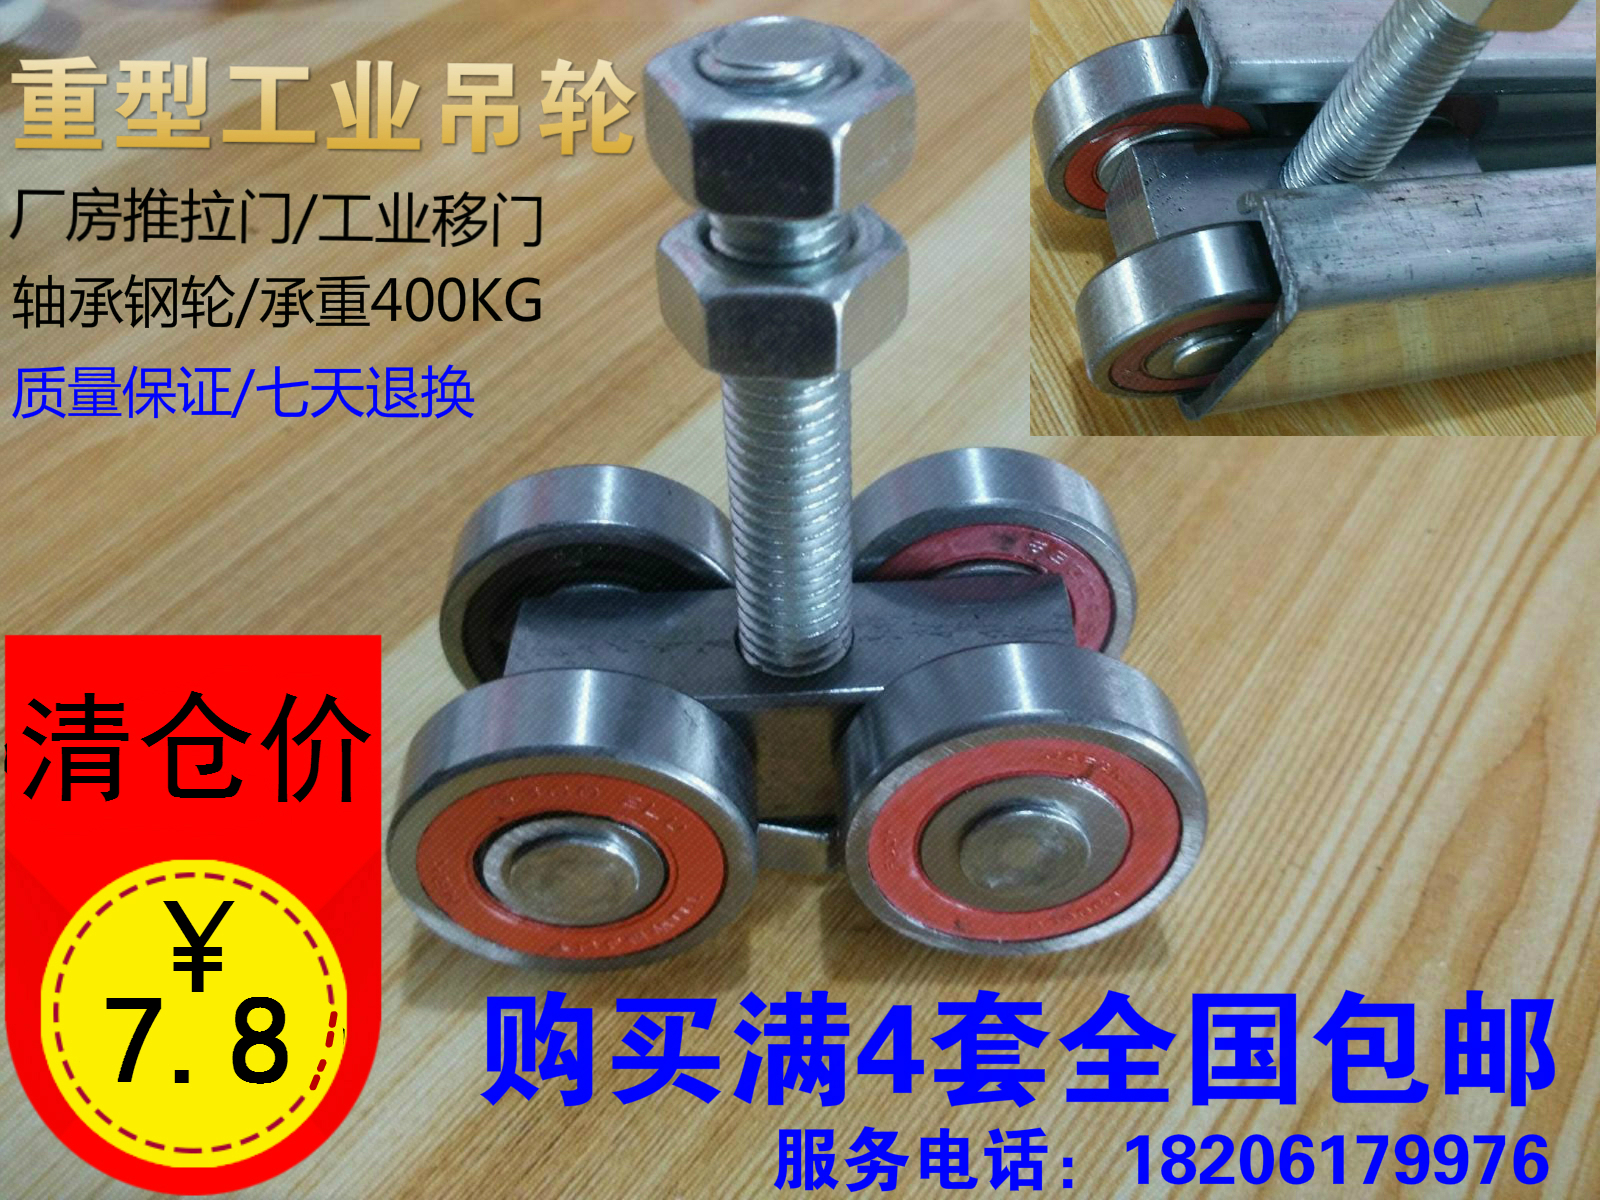 Heavy Duty Industrial Hanging Wheel Roller Bearing Wheel Hanging